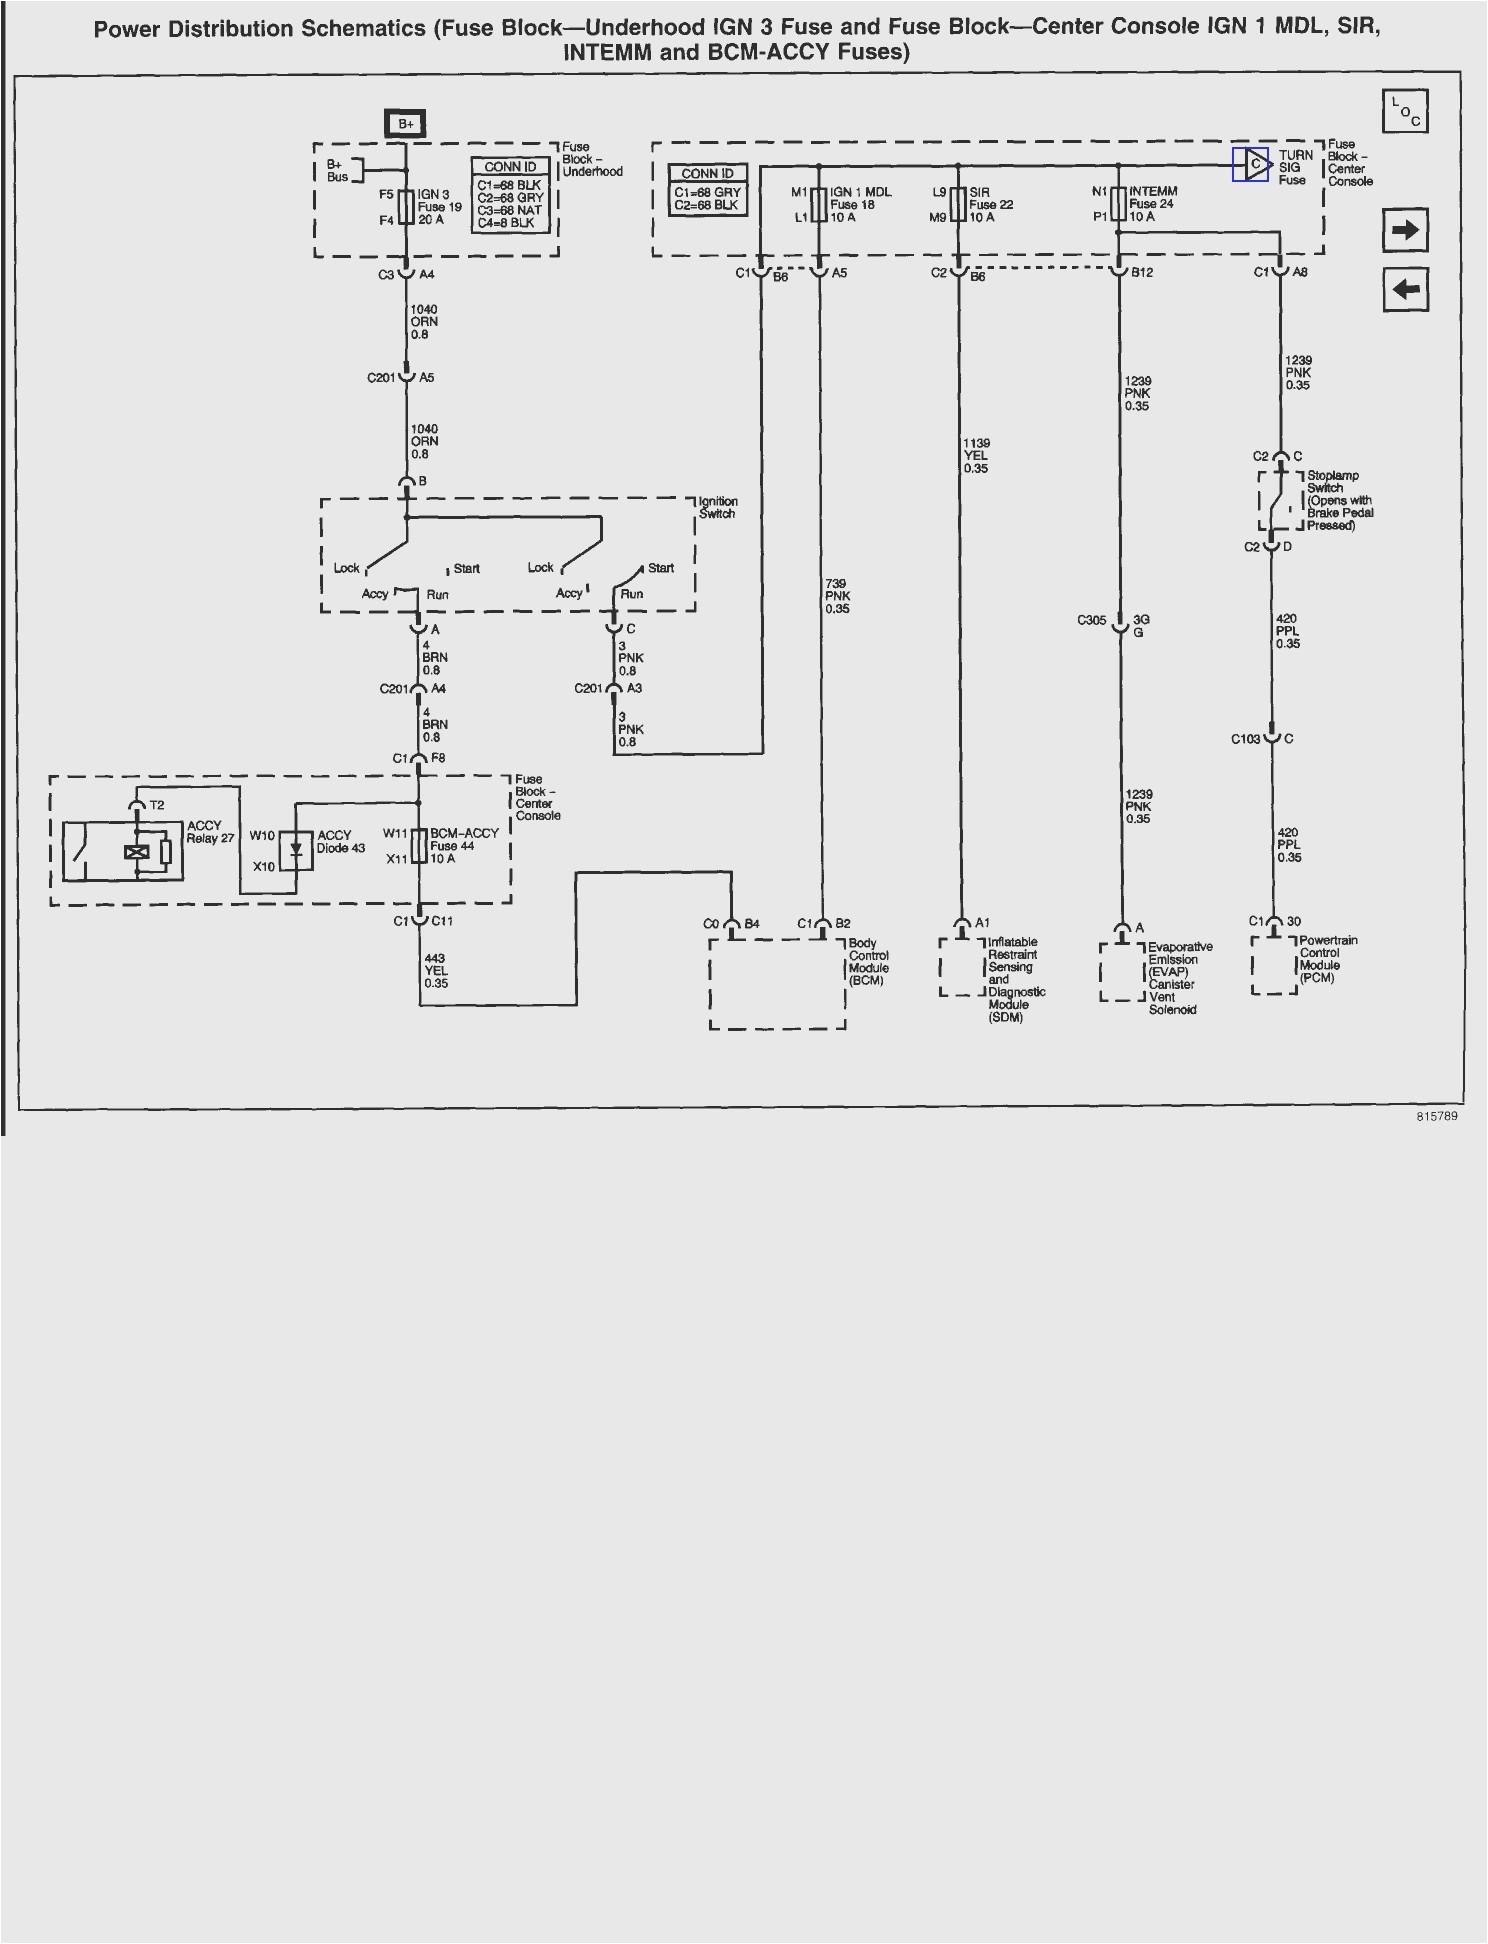 buick abs wiring diagram wiring diagram forward 2002 buick century abs wiring diagram buick abs wiring diagram